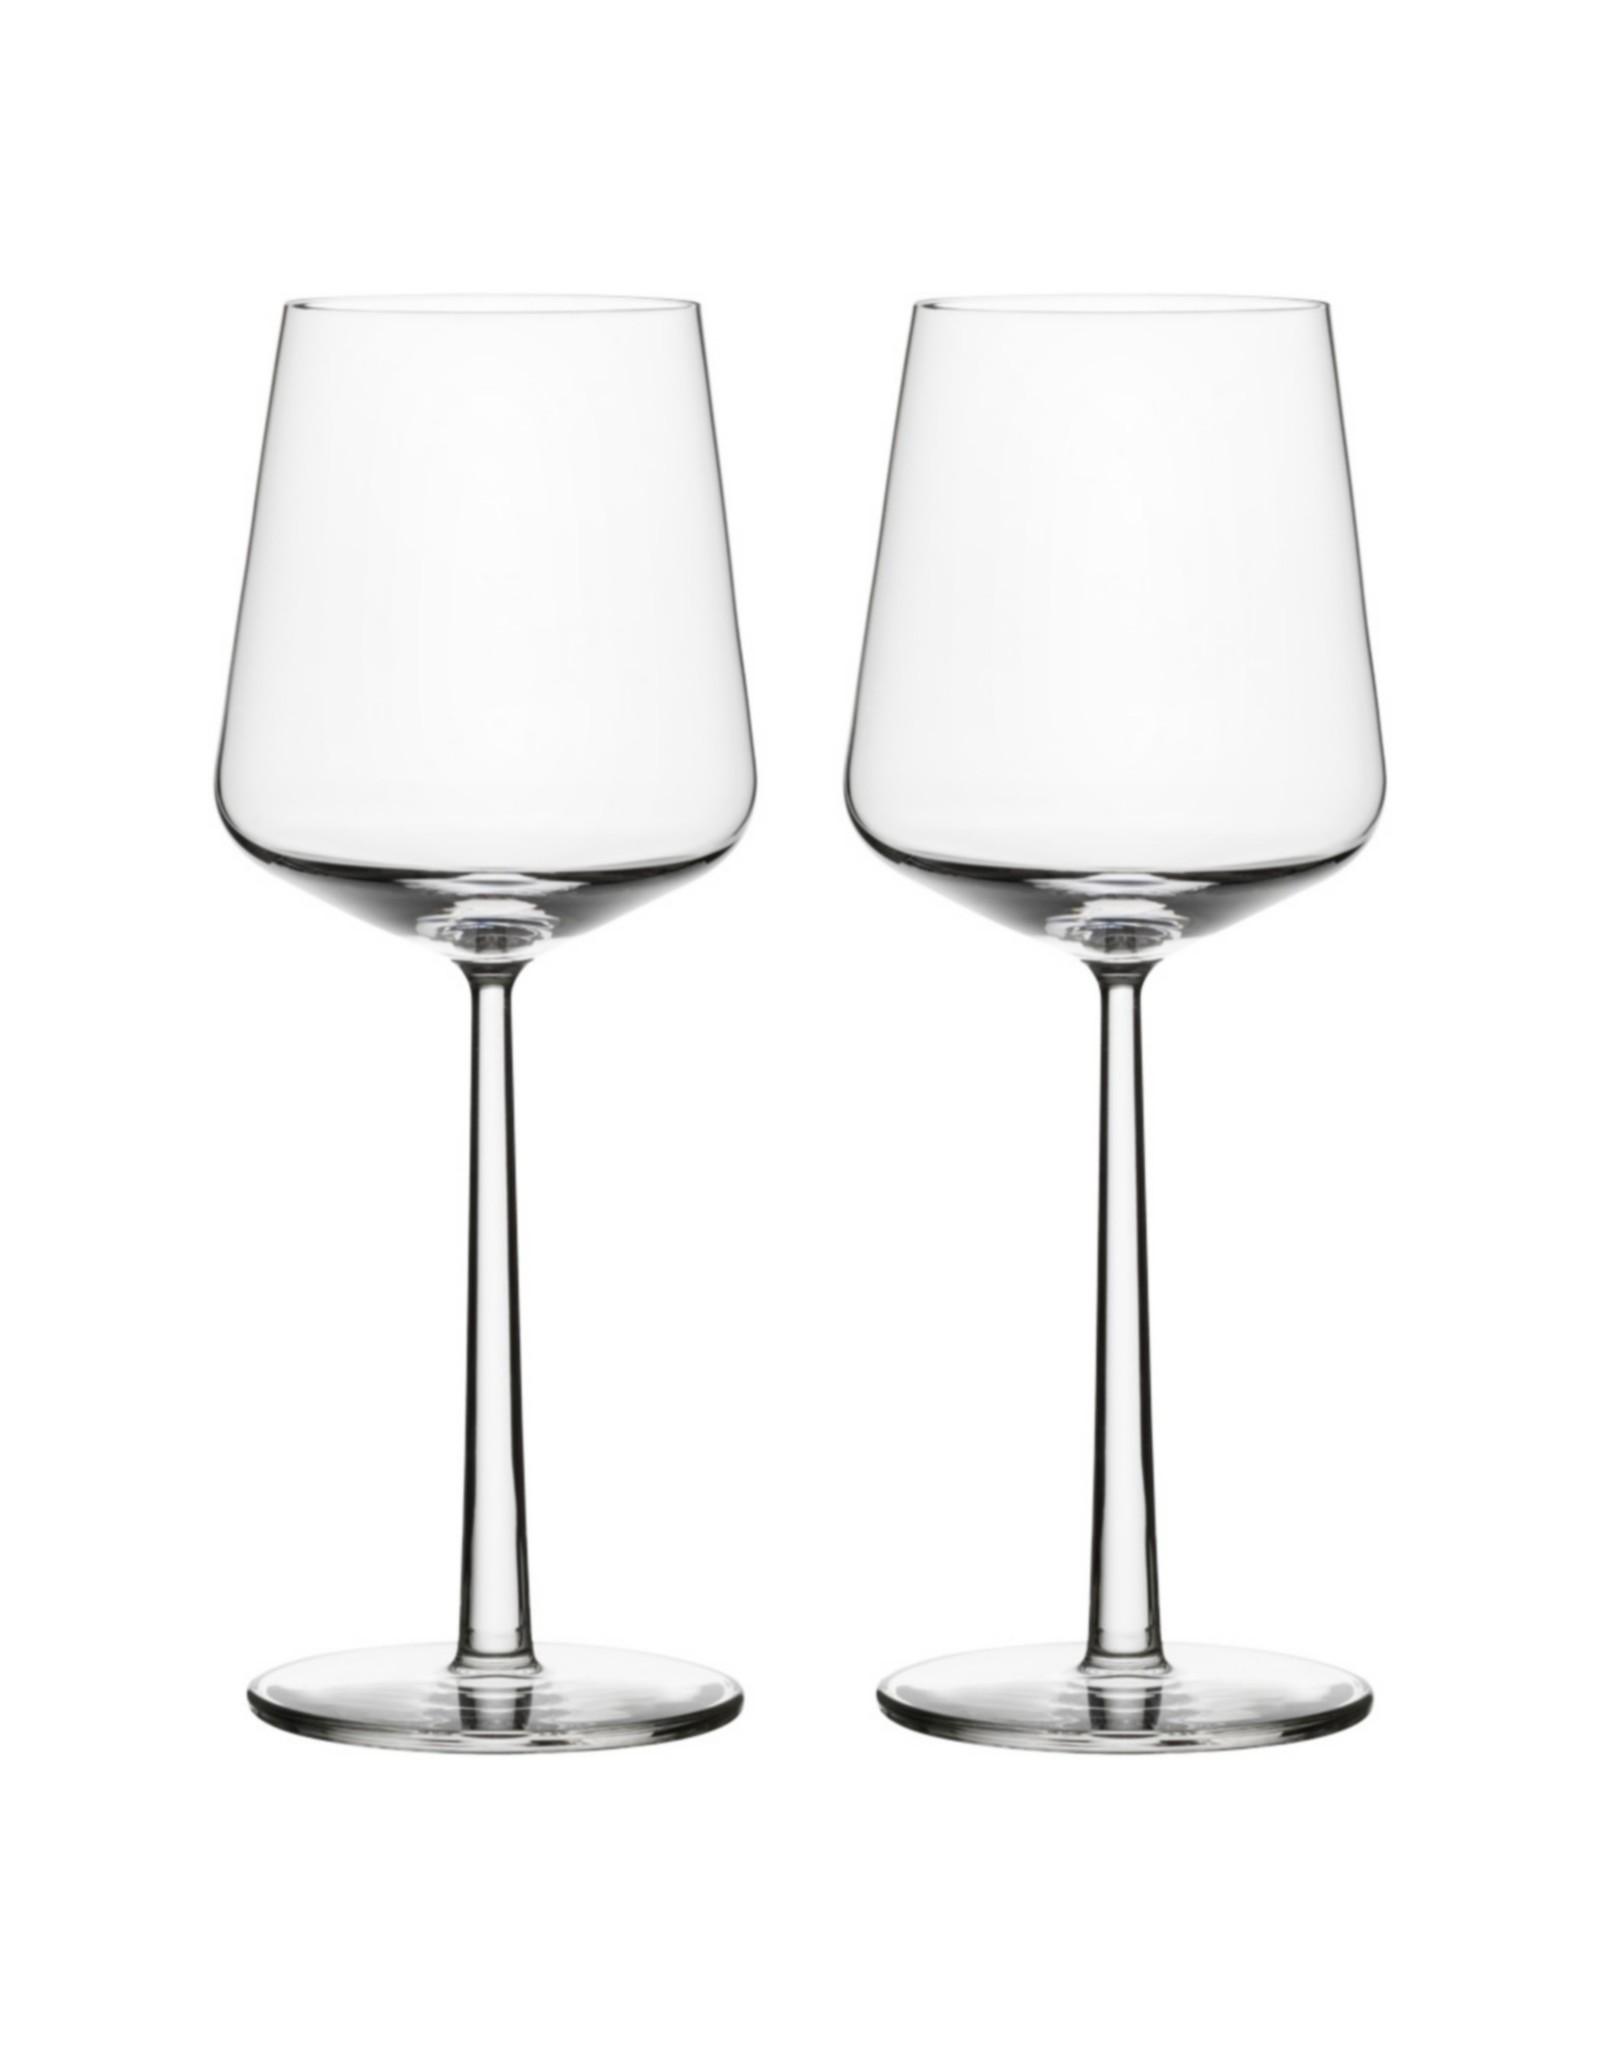 Iittala Iittala - Essence - Rode wijnglas - 6 stuks